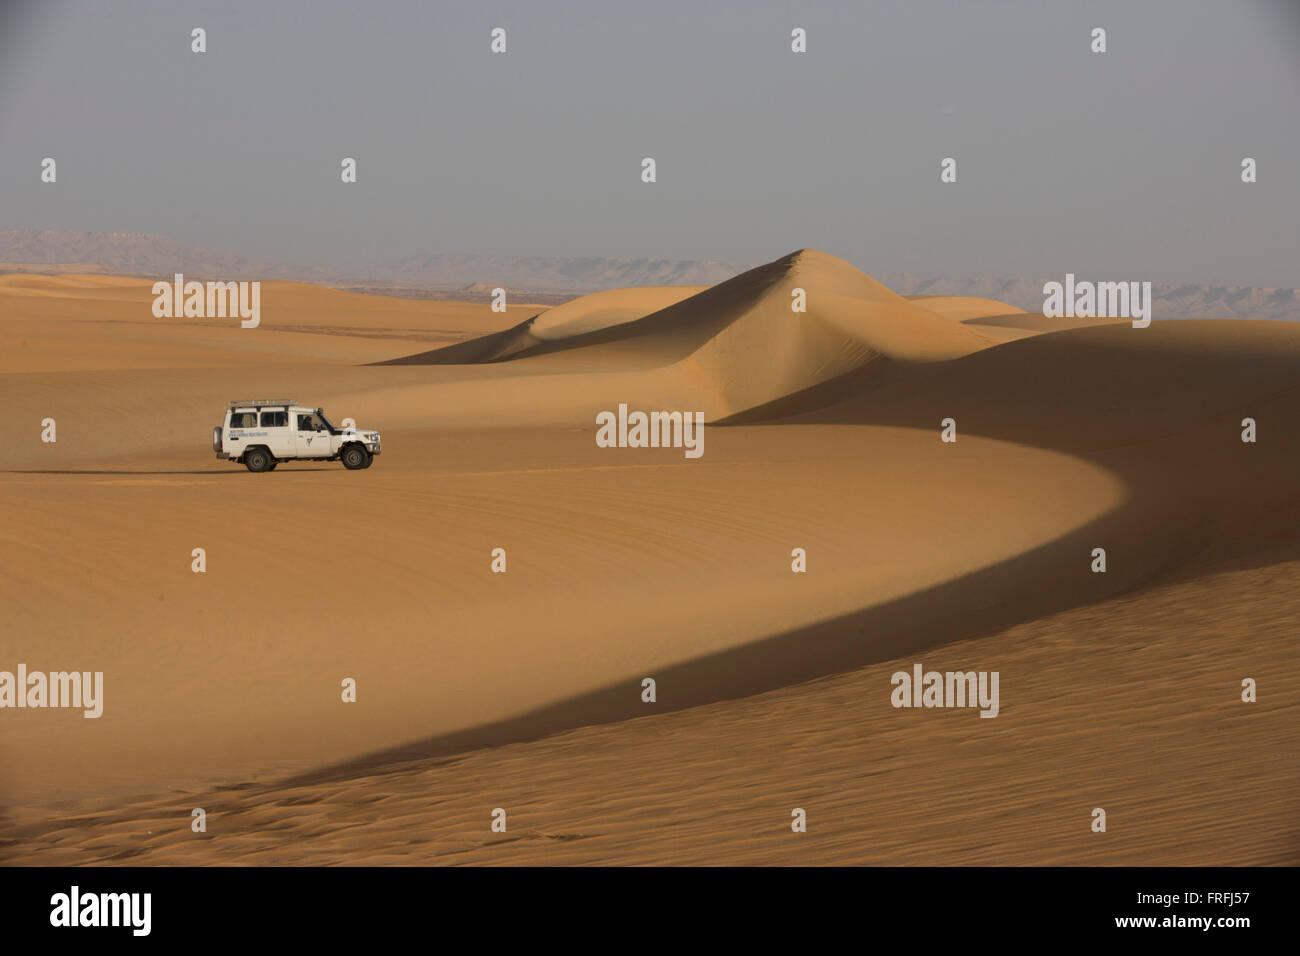 A 4x4 desert expedition vehicle climbs a sand dune at al-Galamun, near Dahkla Oasis, Western Desert, Egypt. The - Stock Image